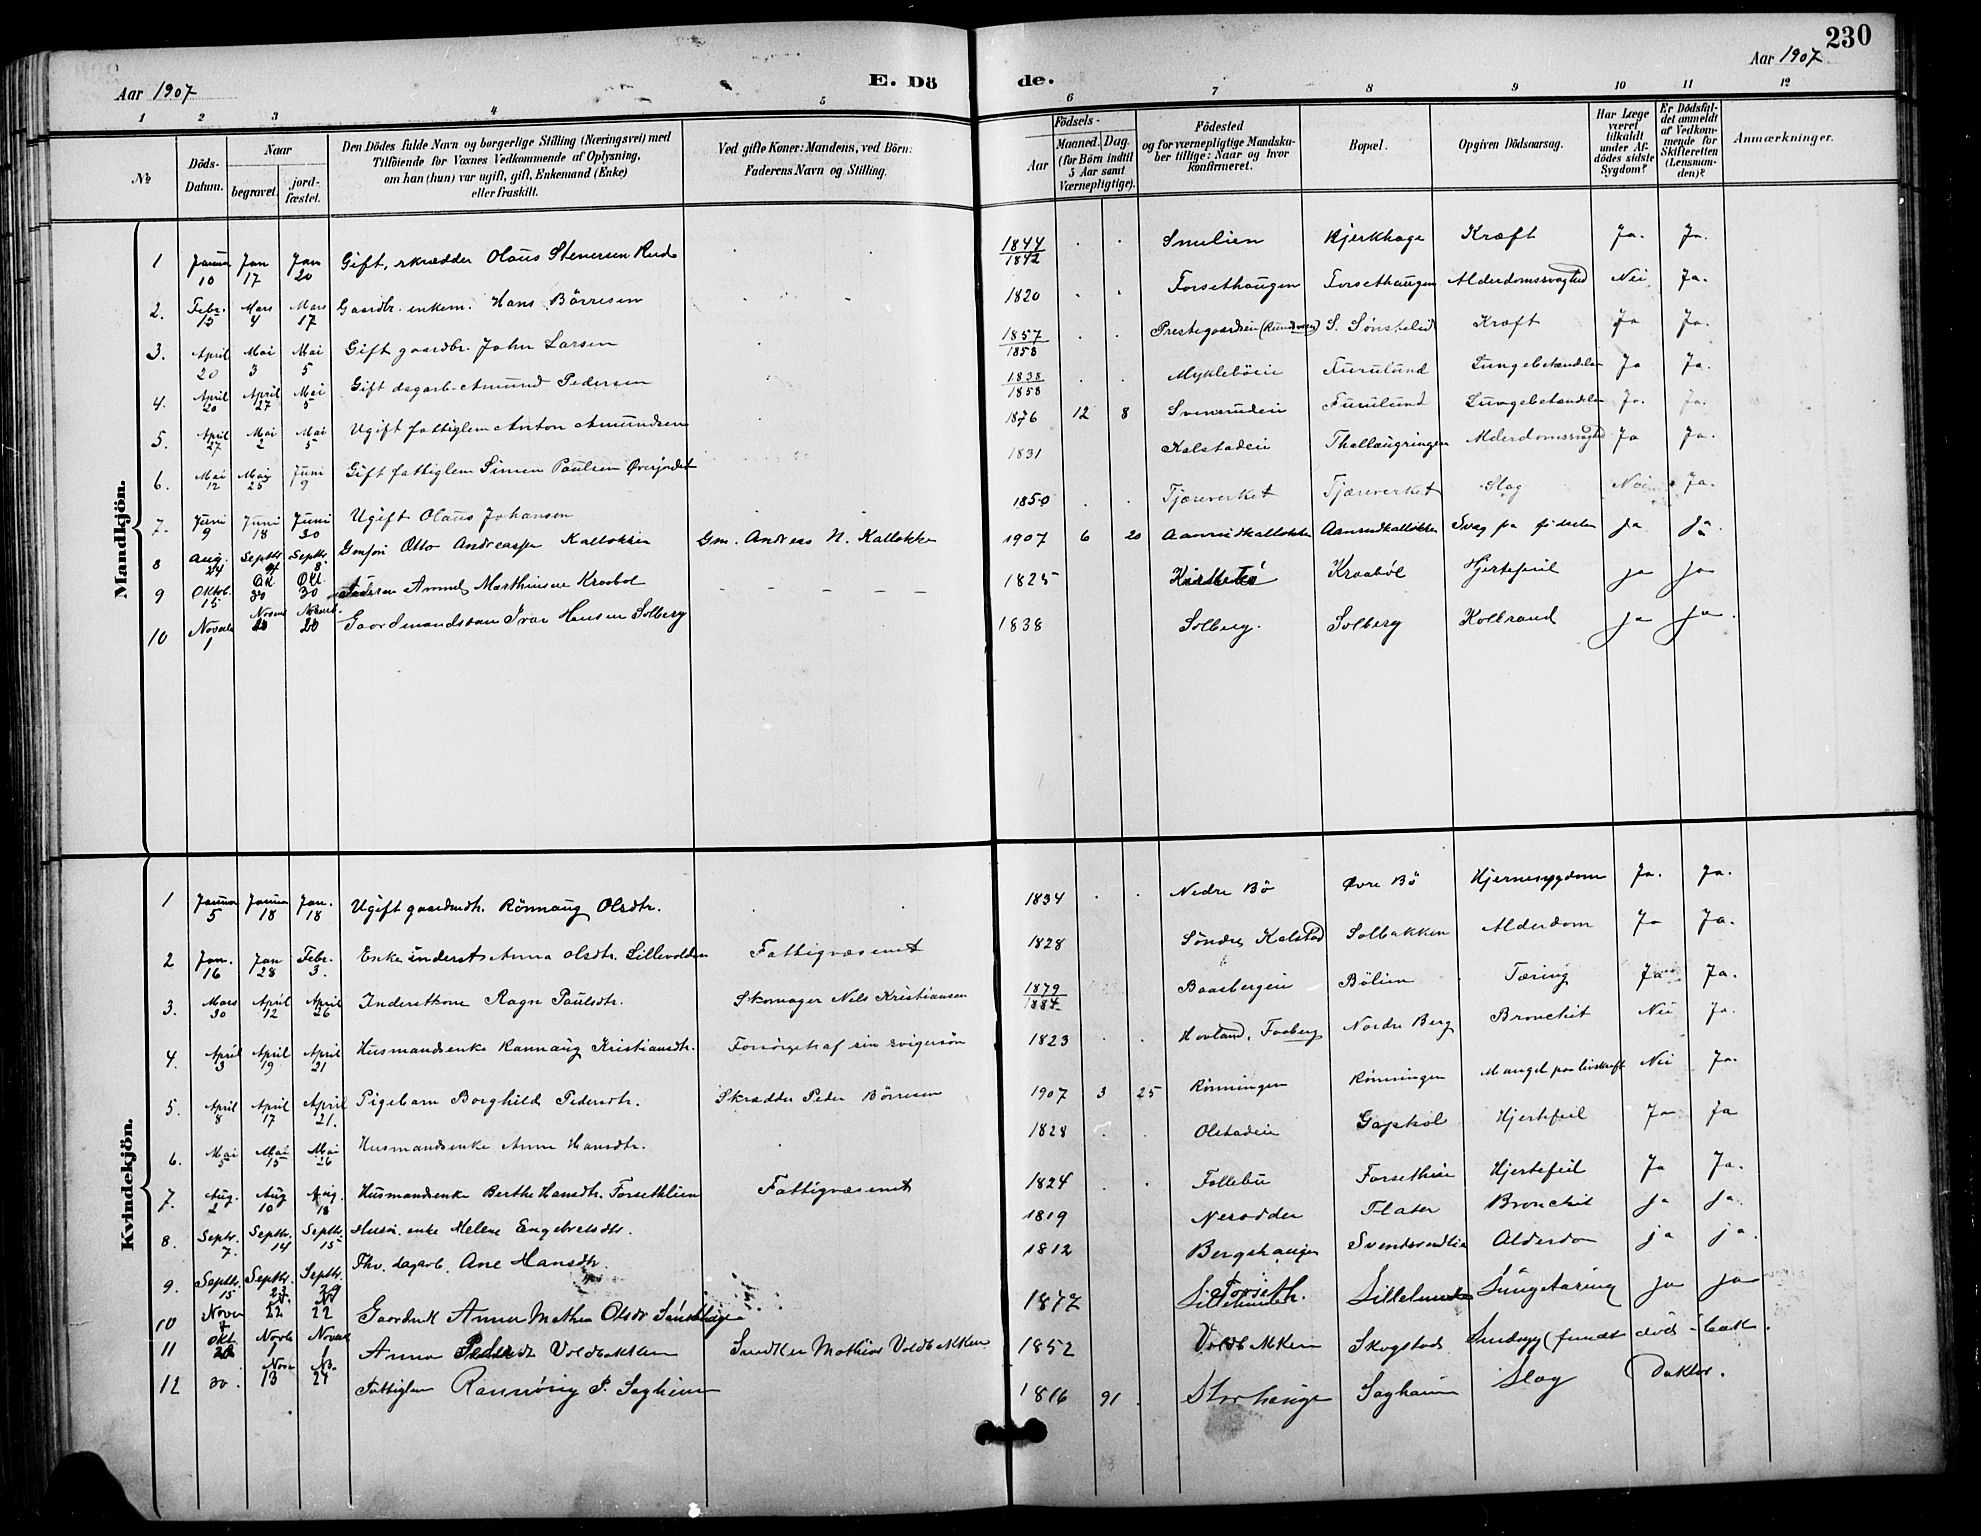 SAH, Vestre Gausdal prestekontor, Klokkerbok nr. 3, 1896-1925, s. 230